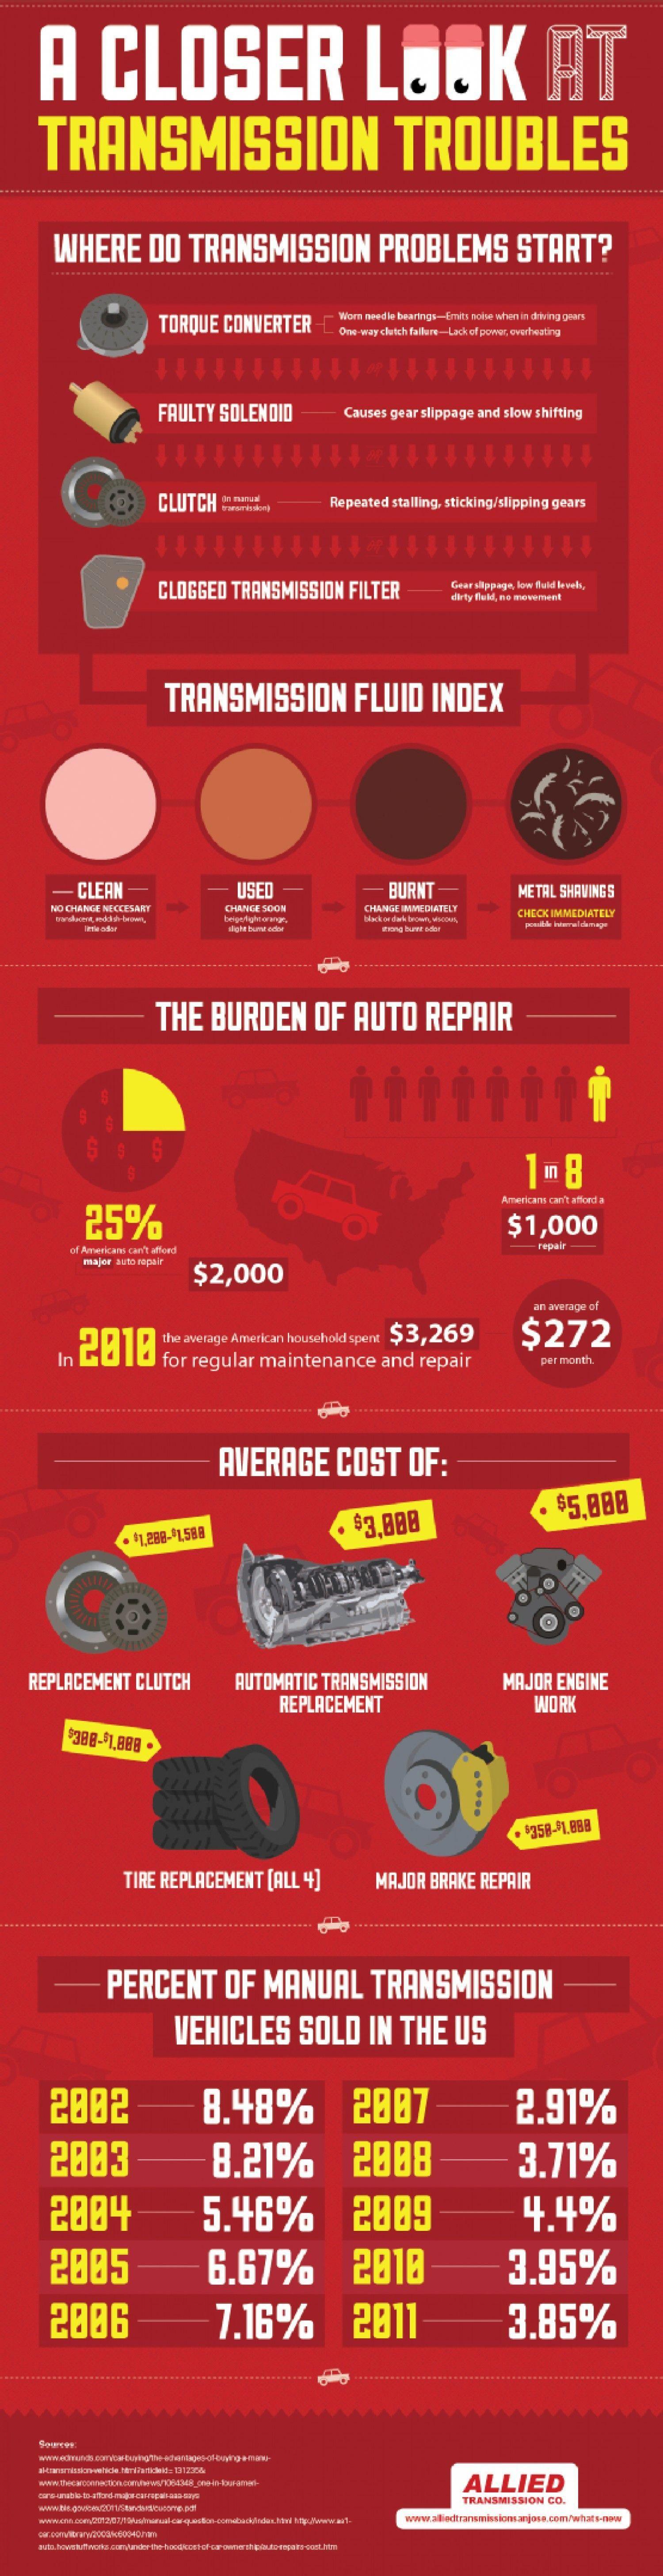 A Closer Look At Transmission Troubles Infographic Repair Auto Repair Car Maintenance